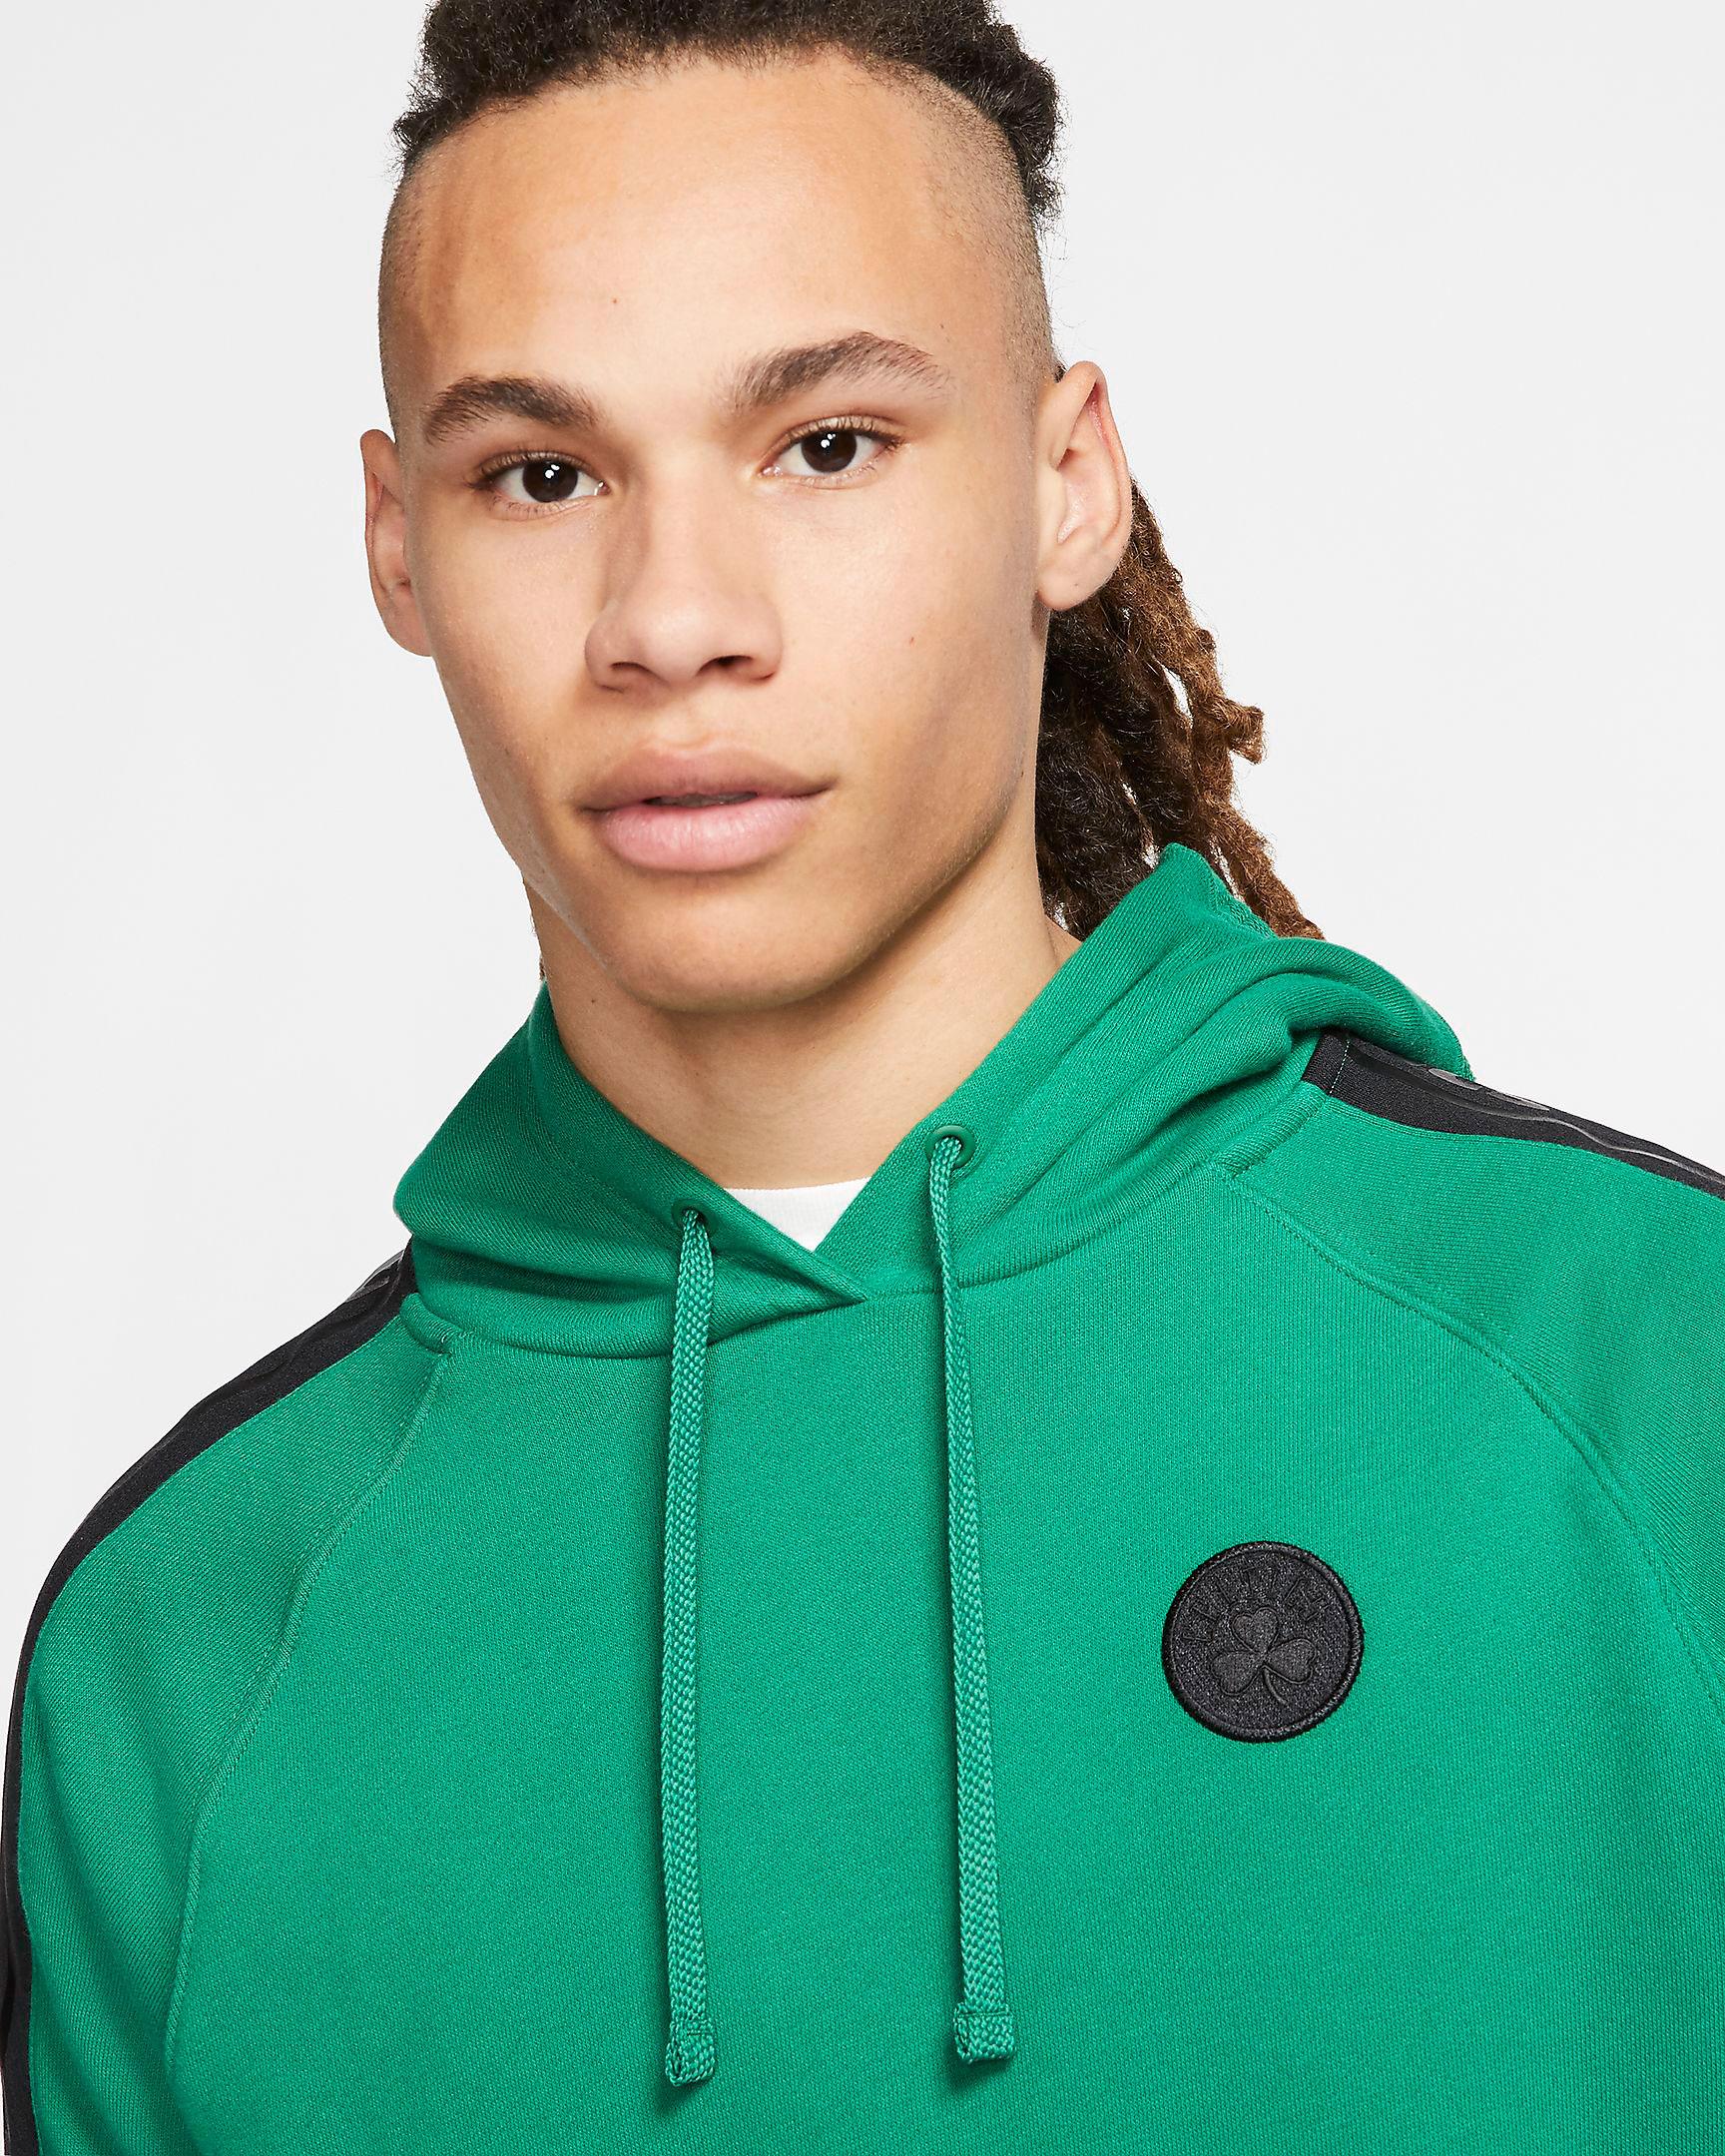 jordan-13-lucky-green-boston-celtics-nike-hoodie-2